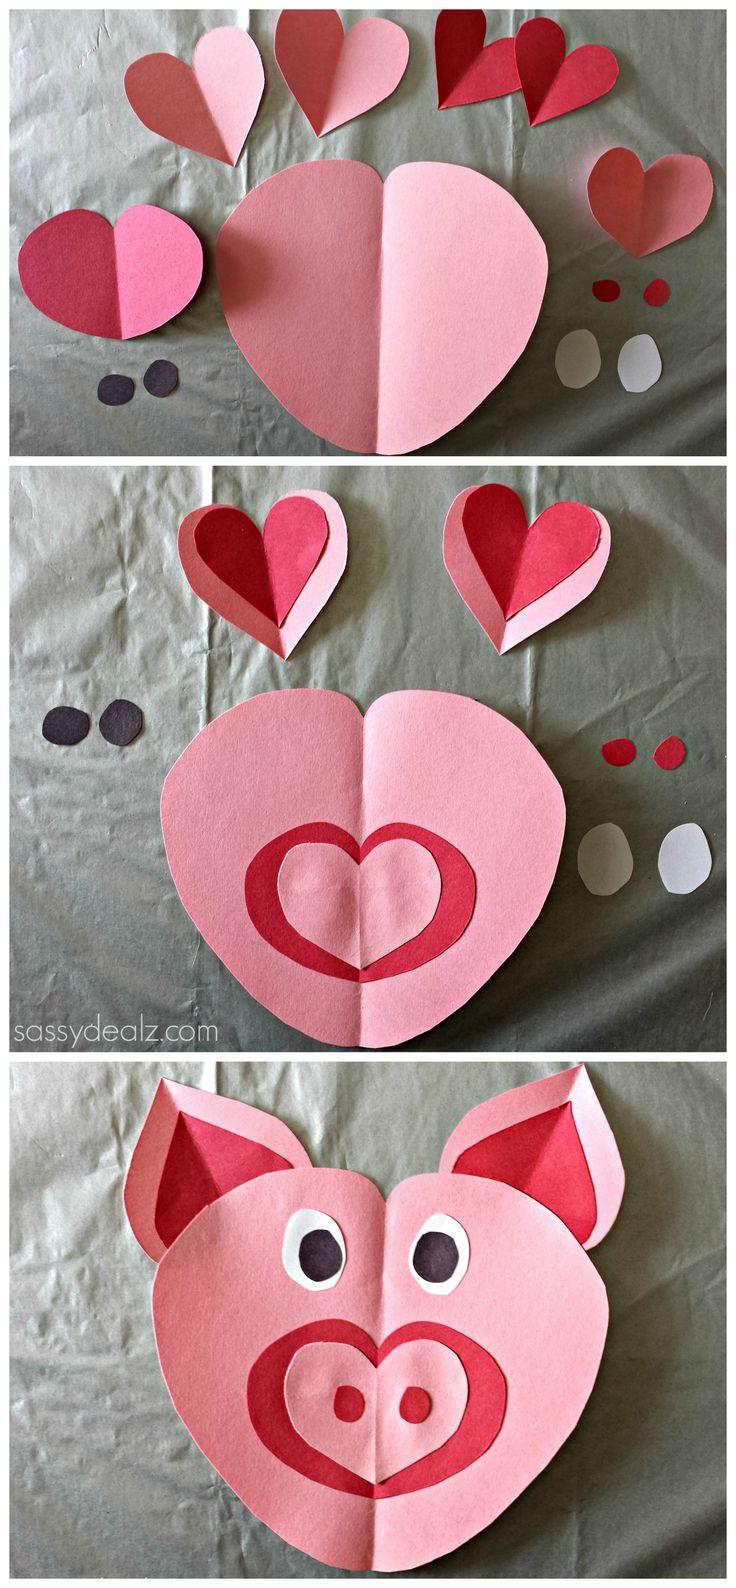 Valentines day crafts for children - Heart Pig Craft For Kids